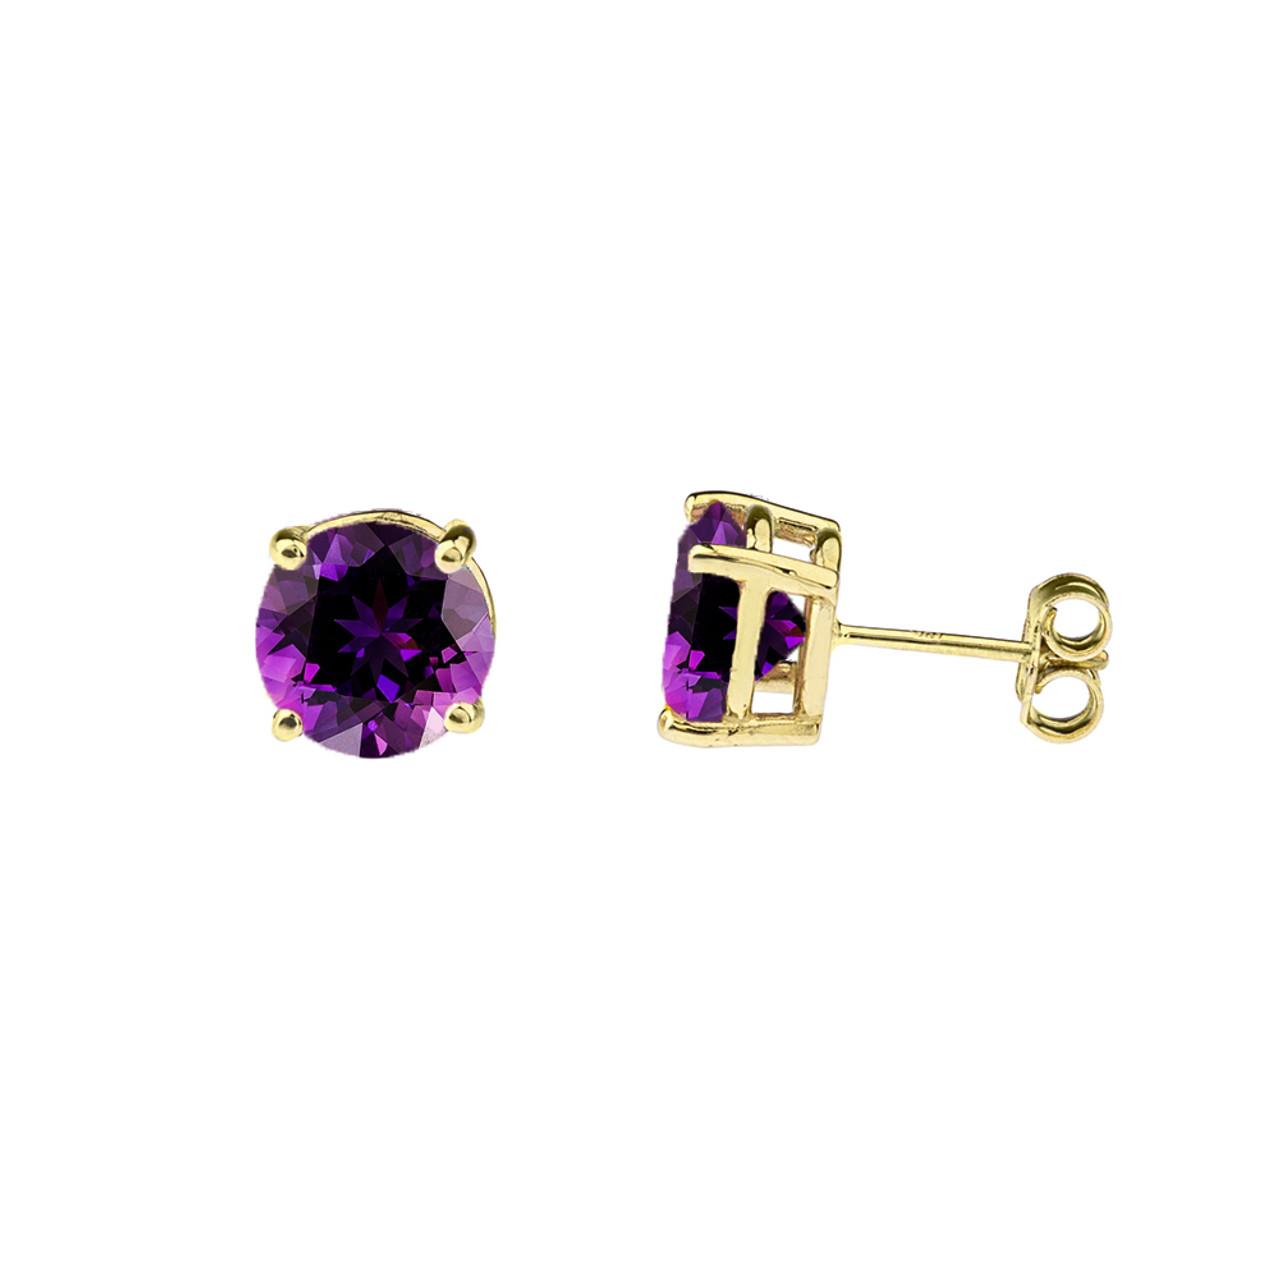 10K Yellow Gold February Birthstone Amethyst (LCAM) Earrings